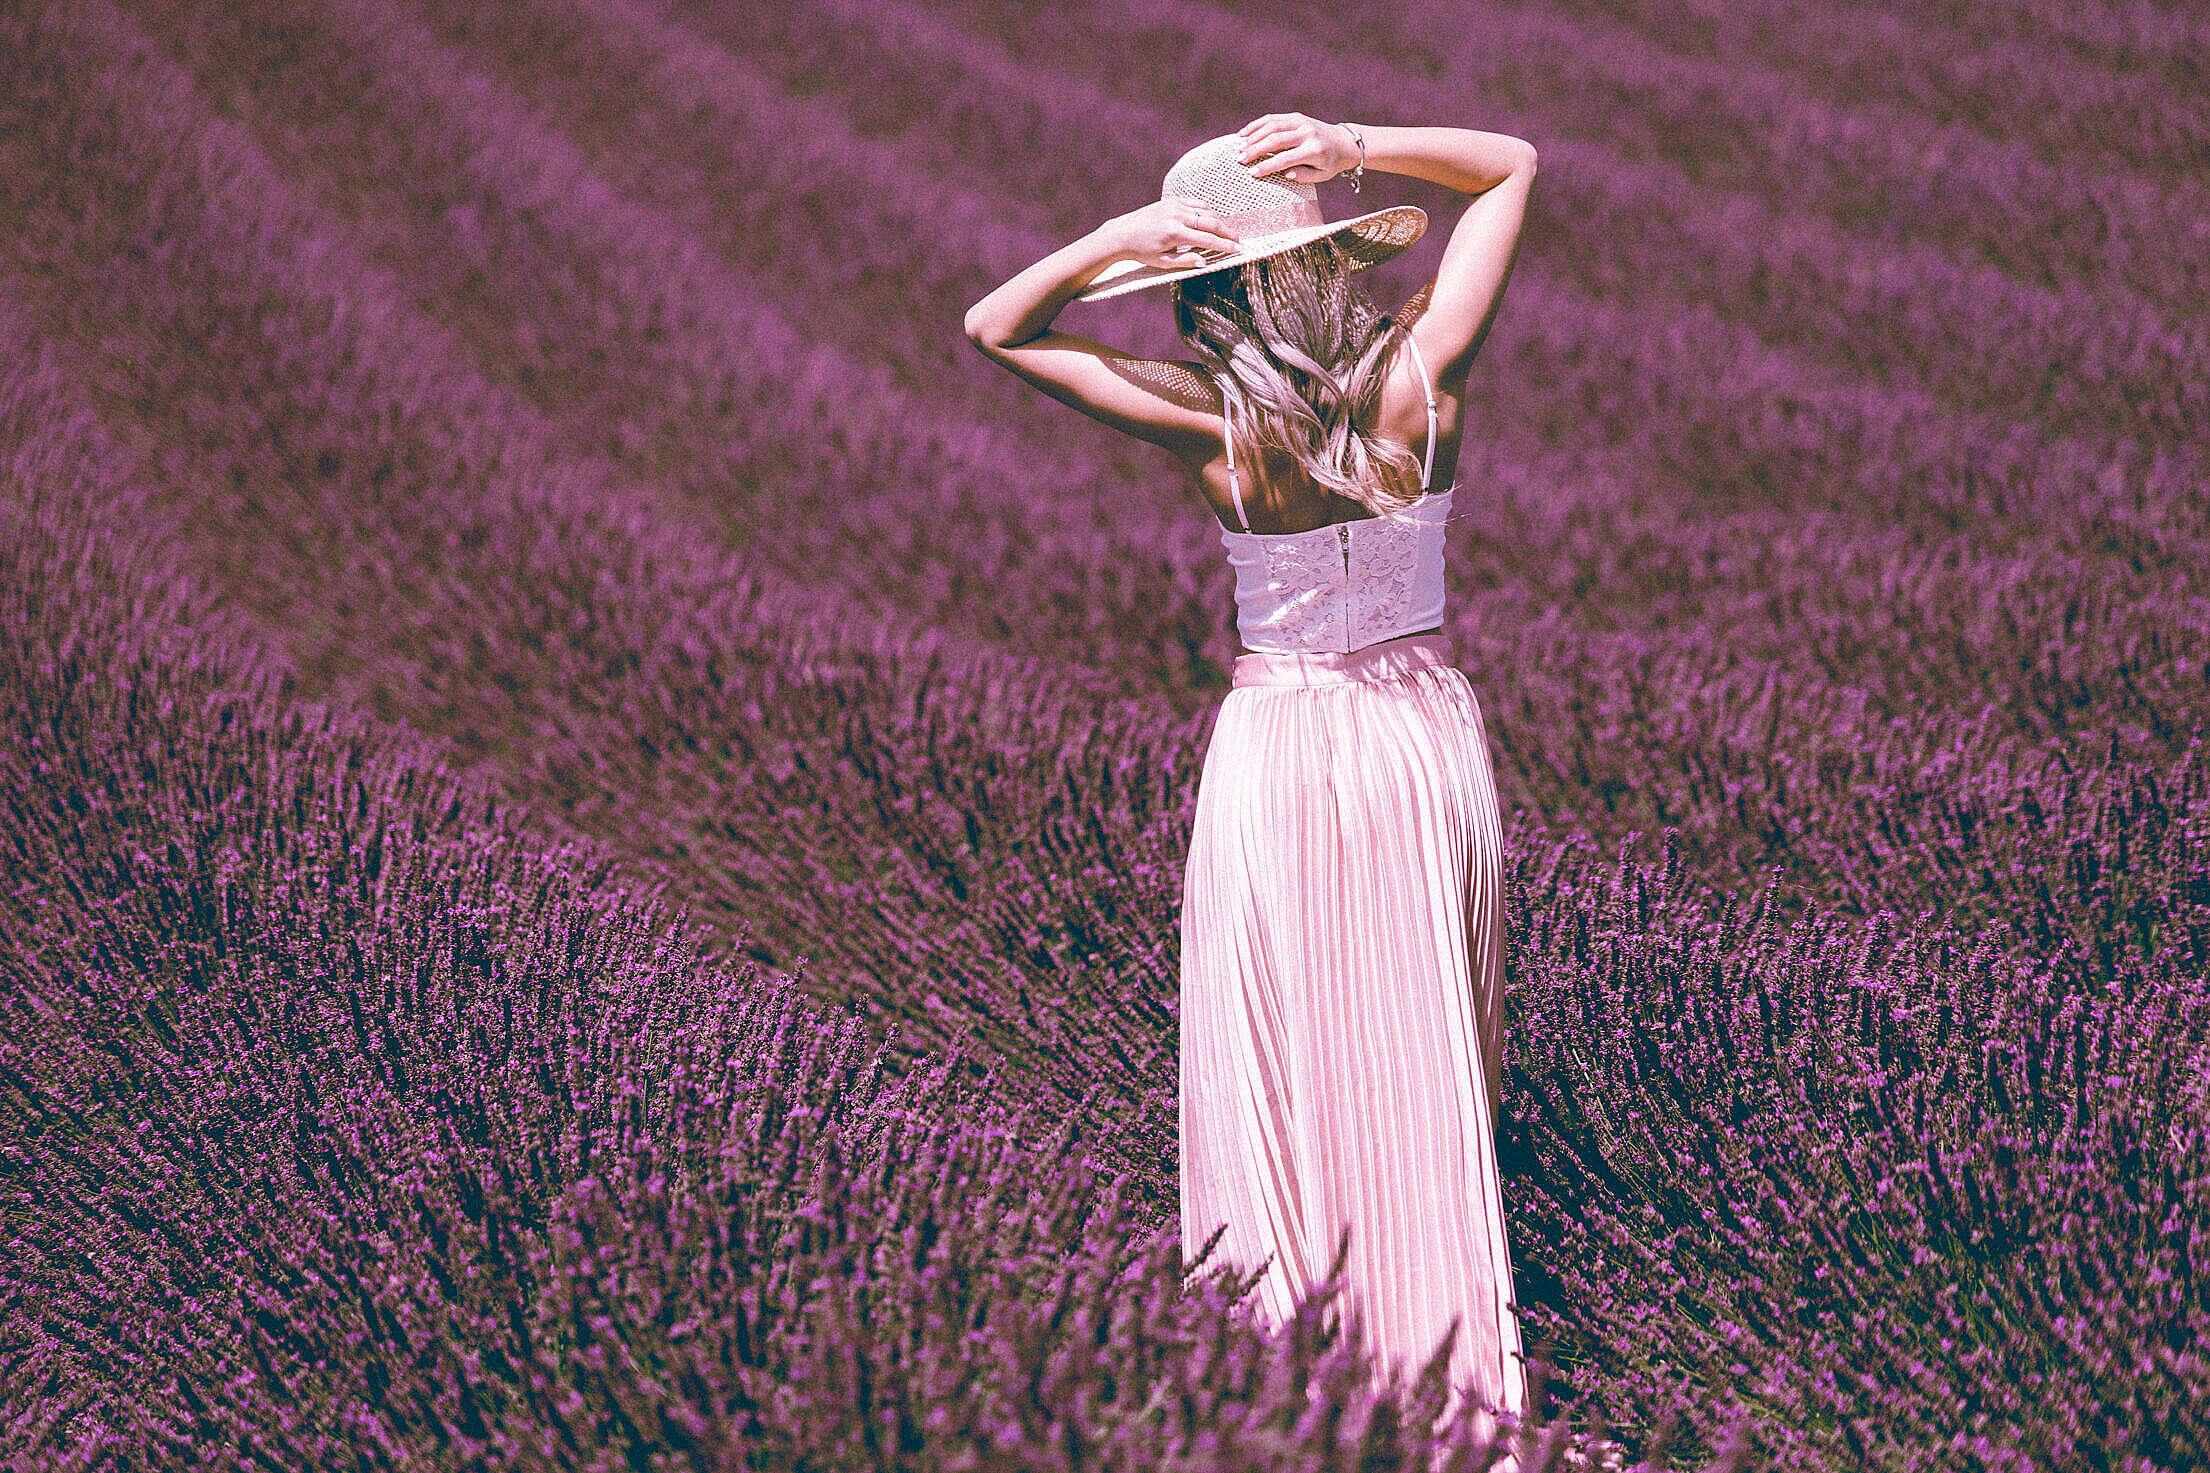 Beautiful Woman Posing in Lavender Field Free Stock Photo